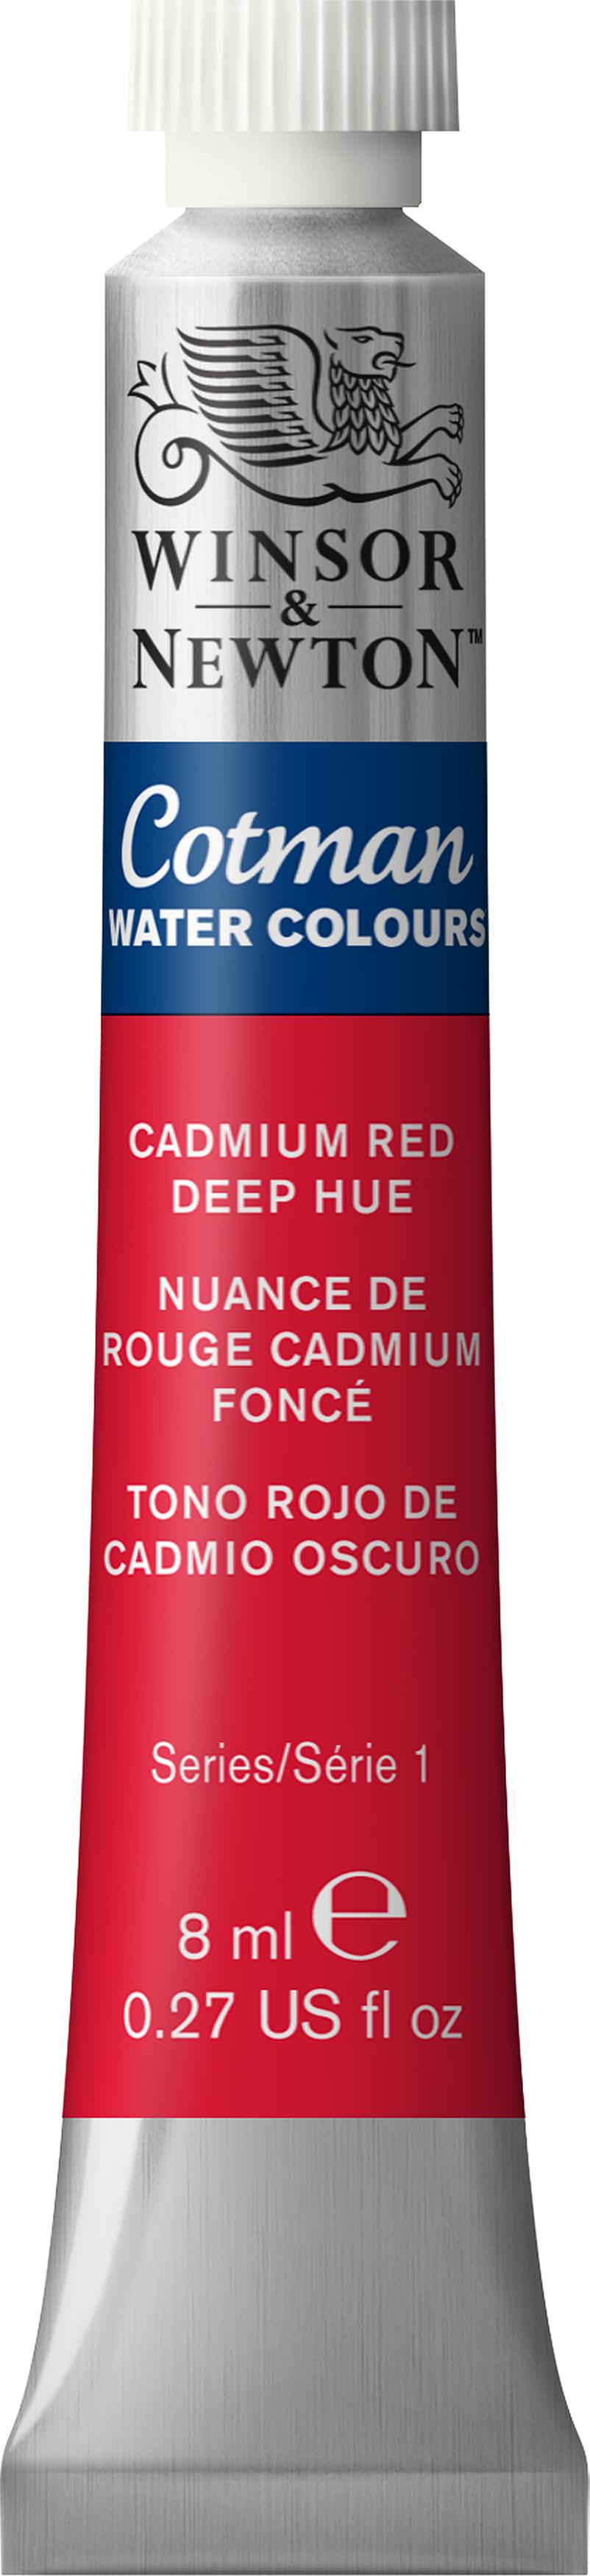 Winsor & Newton Cotman Water Colours 8ml-Cadmium Red Deep Hue